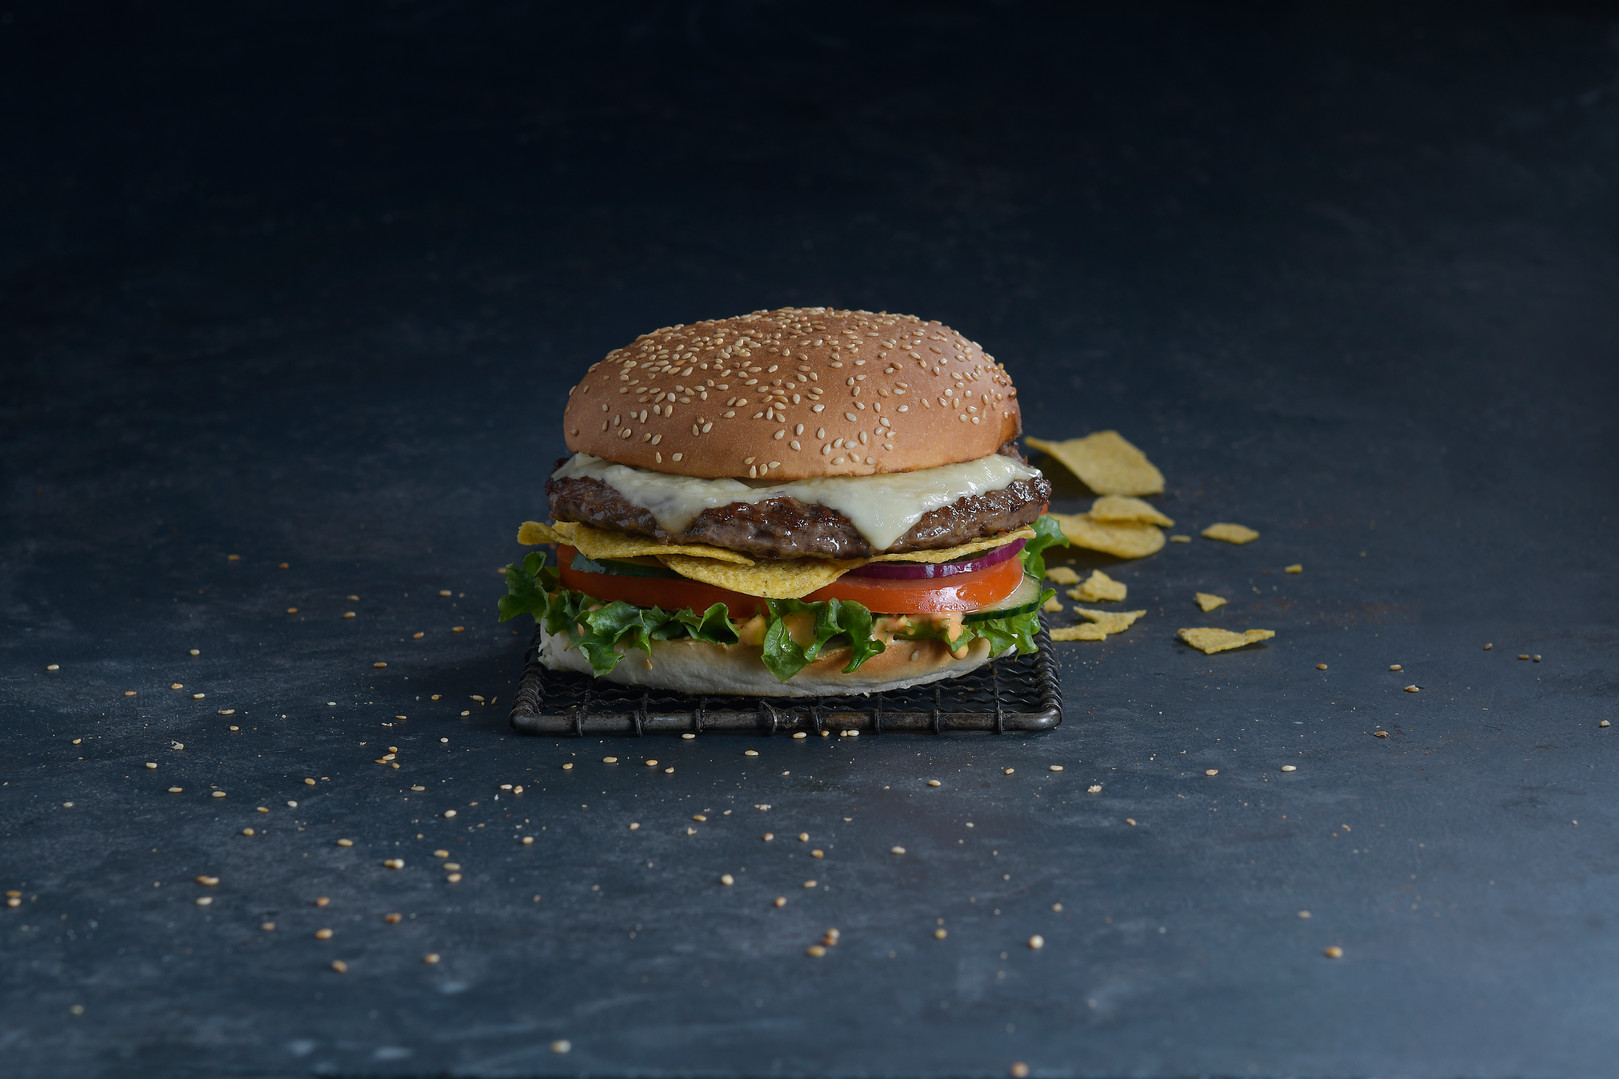 Naco_cheese_burger_22997.jpg